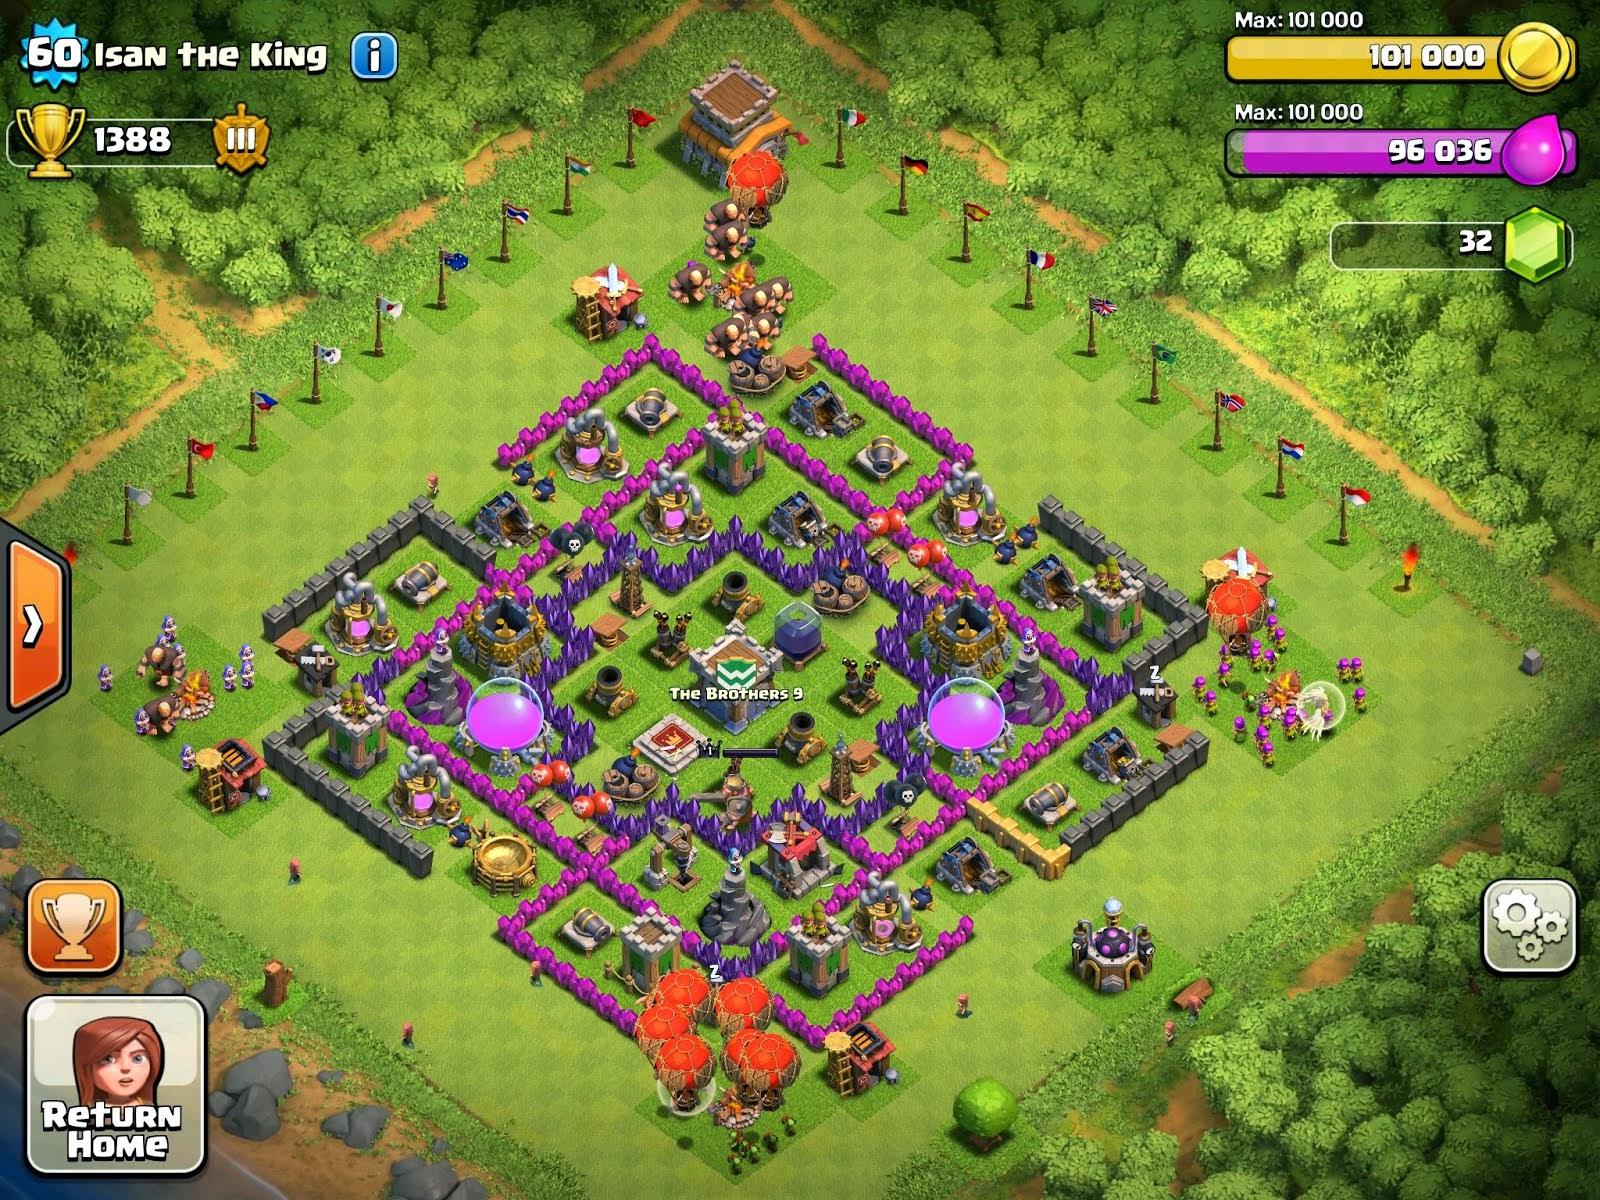 Tipe Tipe Base Clash of Clans